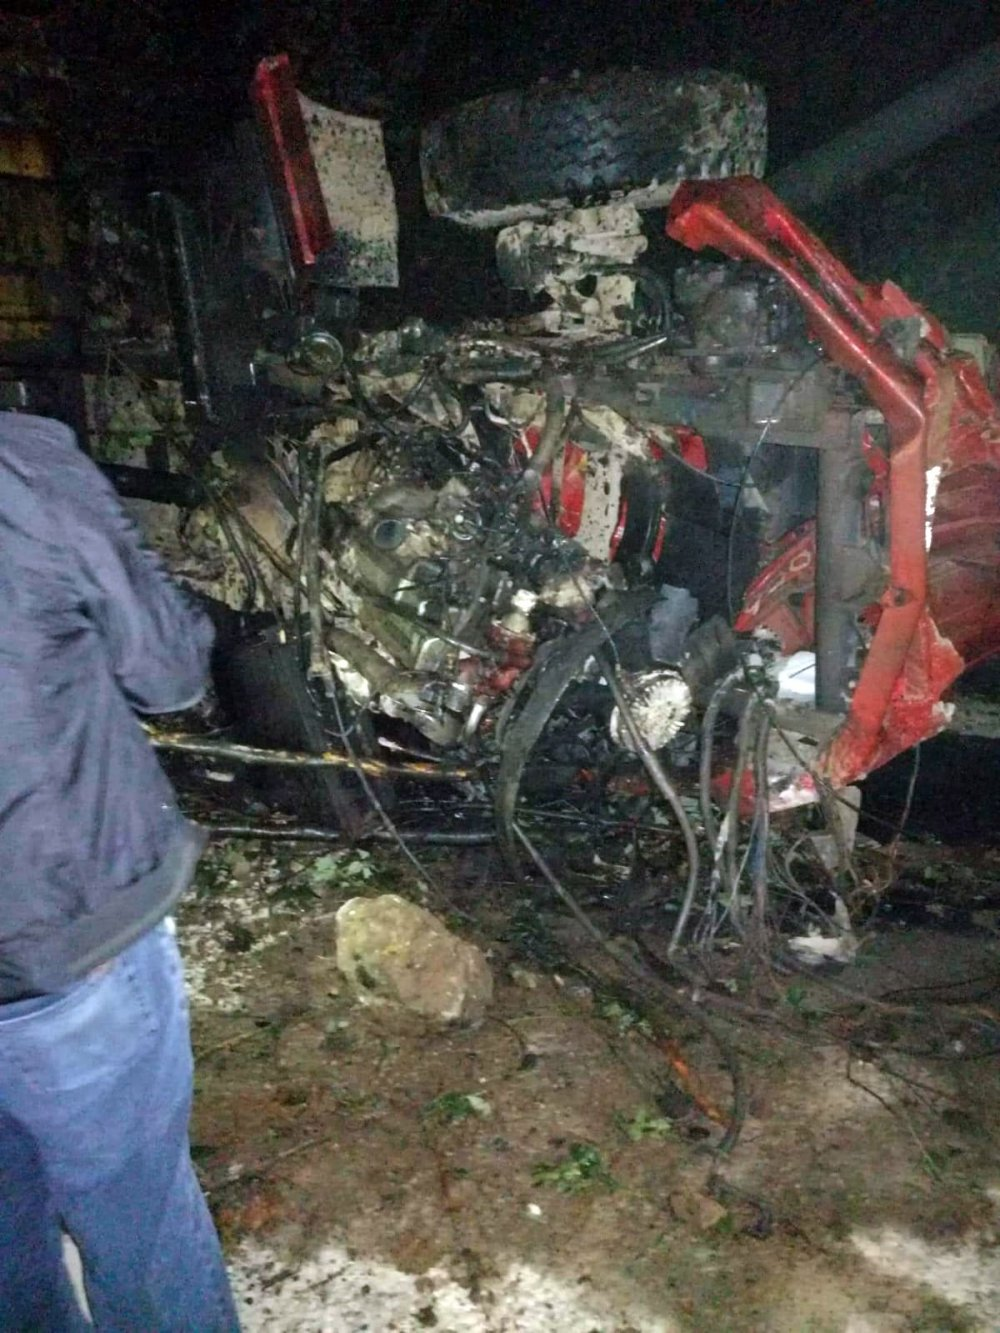 Kamyon uçuruma yuvarlandı: 1 ölü